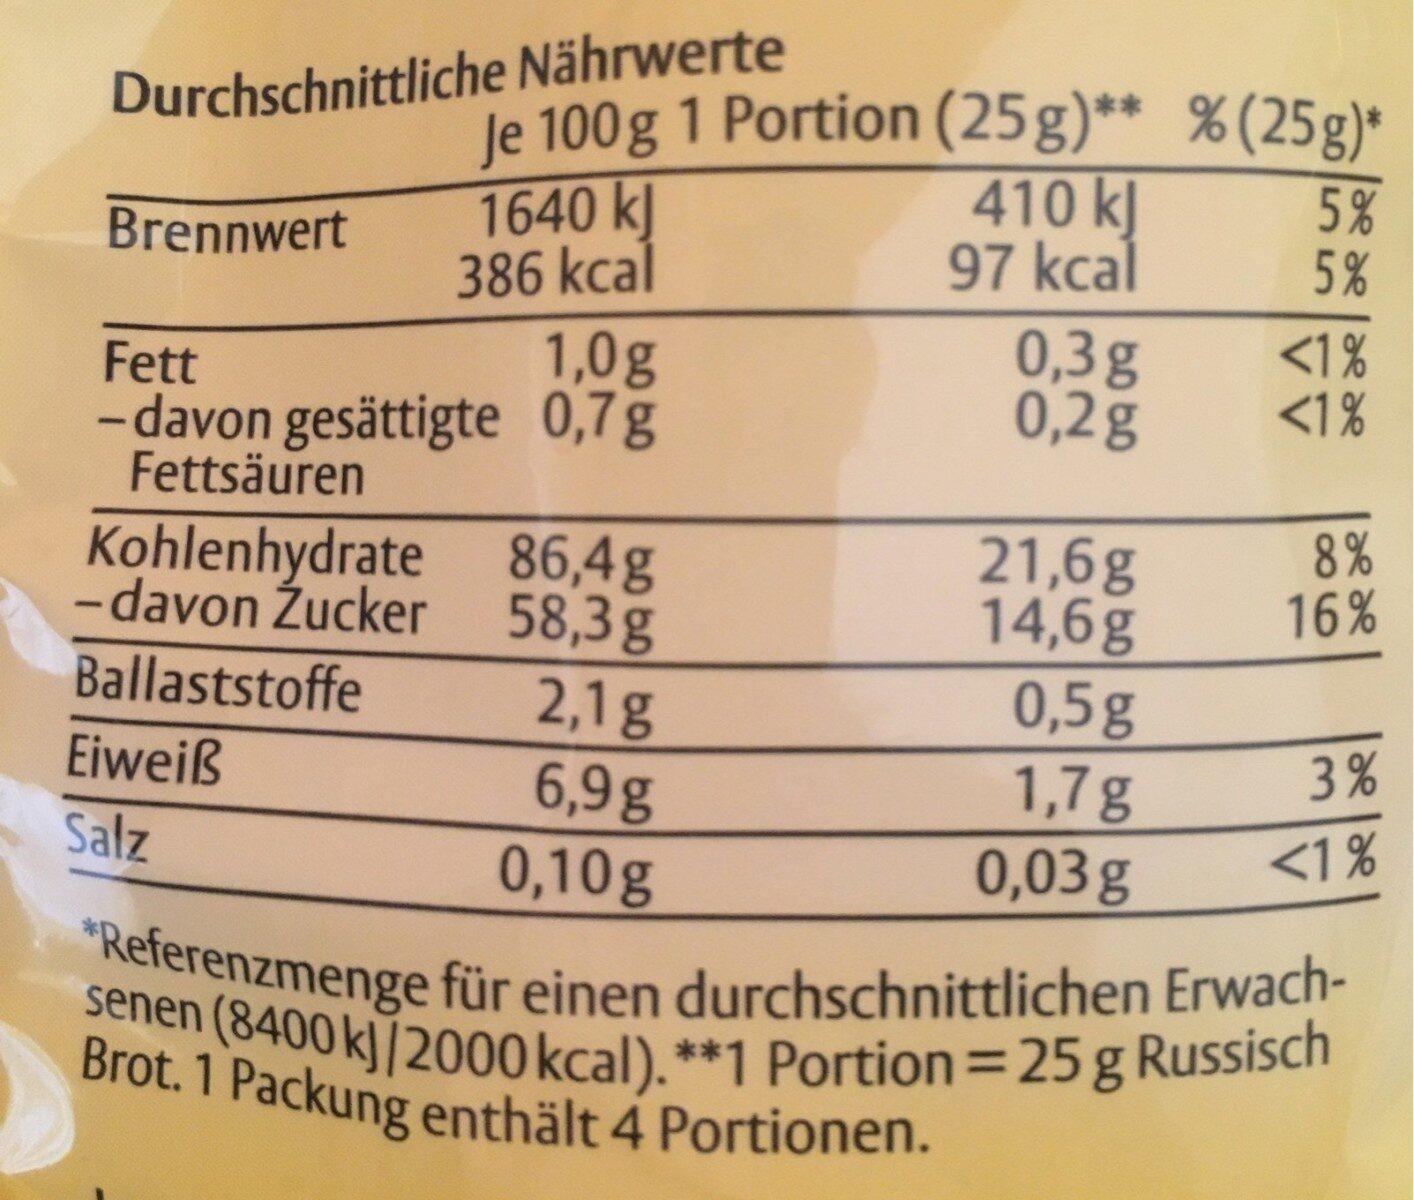 Dresdner Russisch Brot Original - Informations nutritionnelles - de